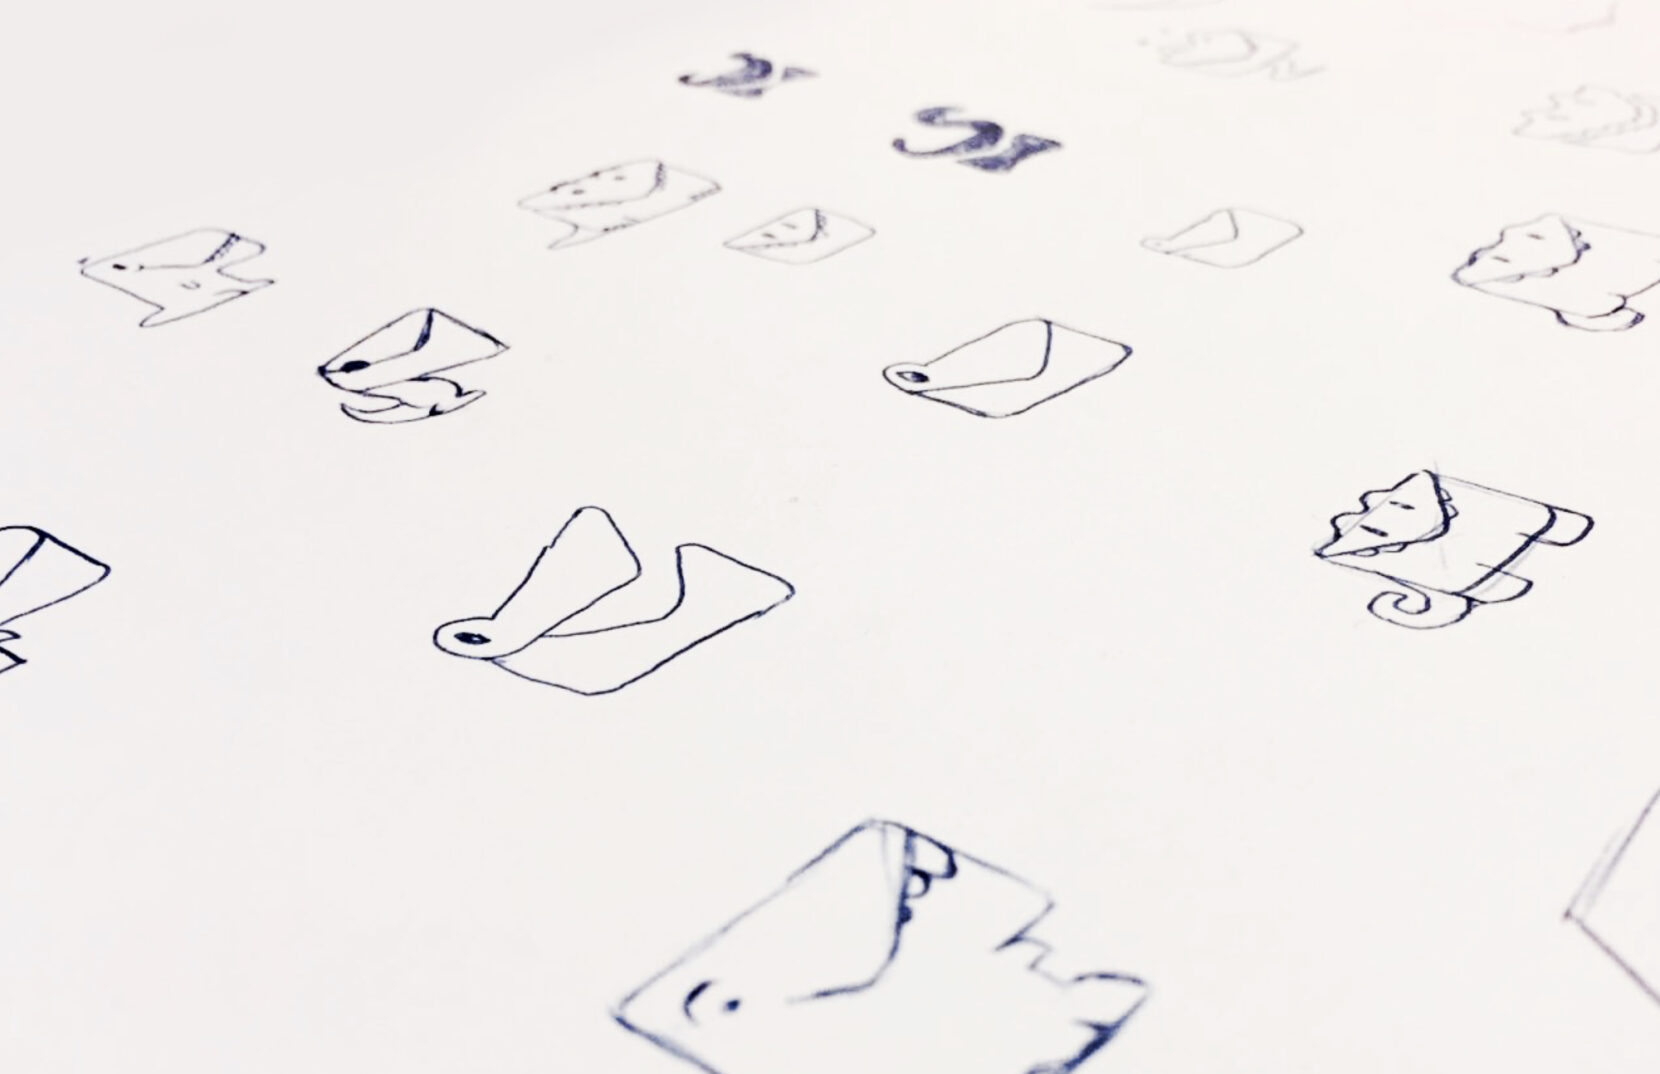 Mailosaur schetsen x2